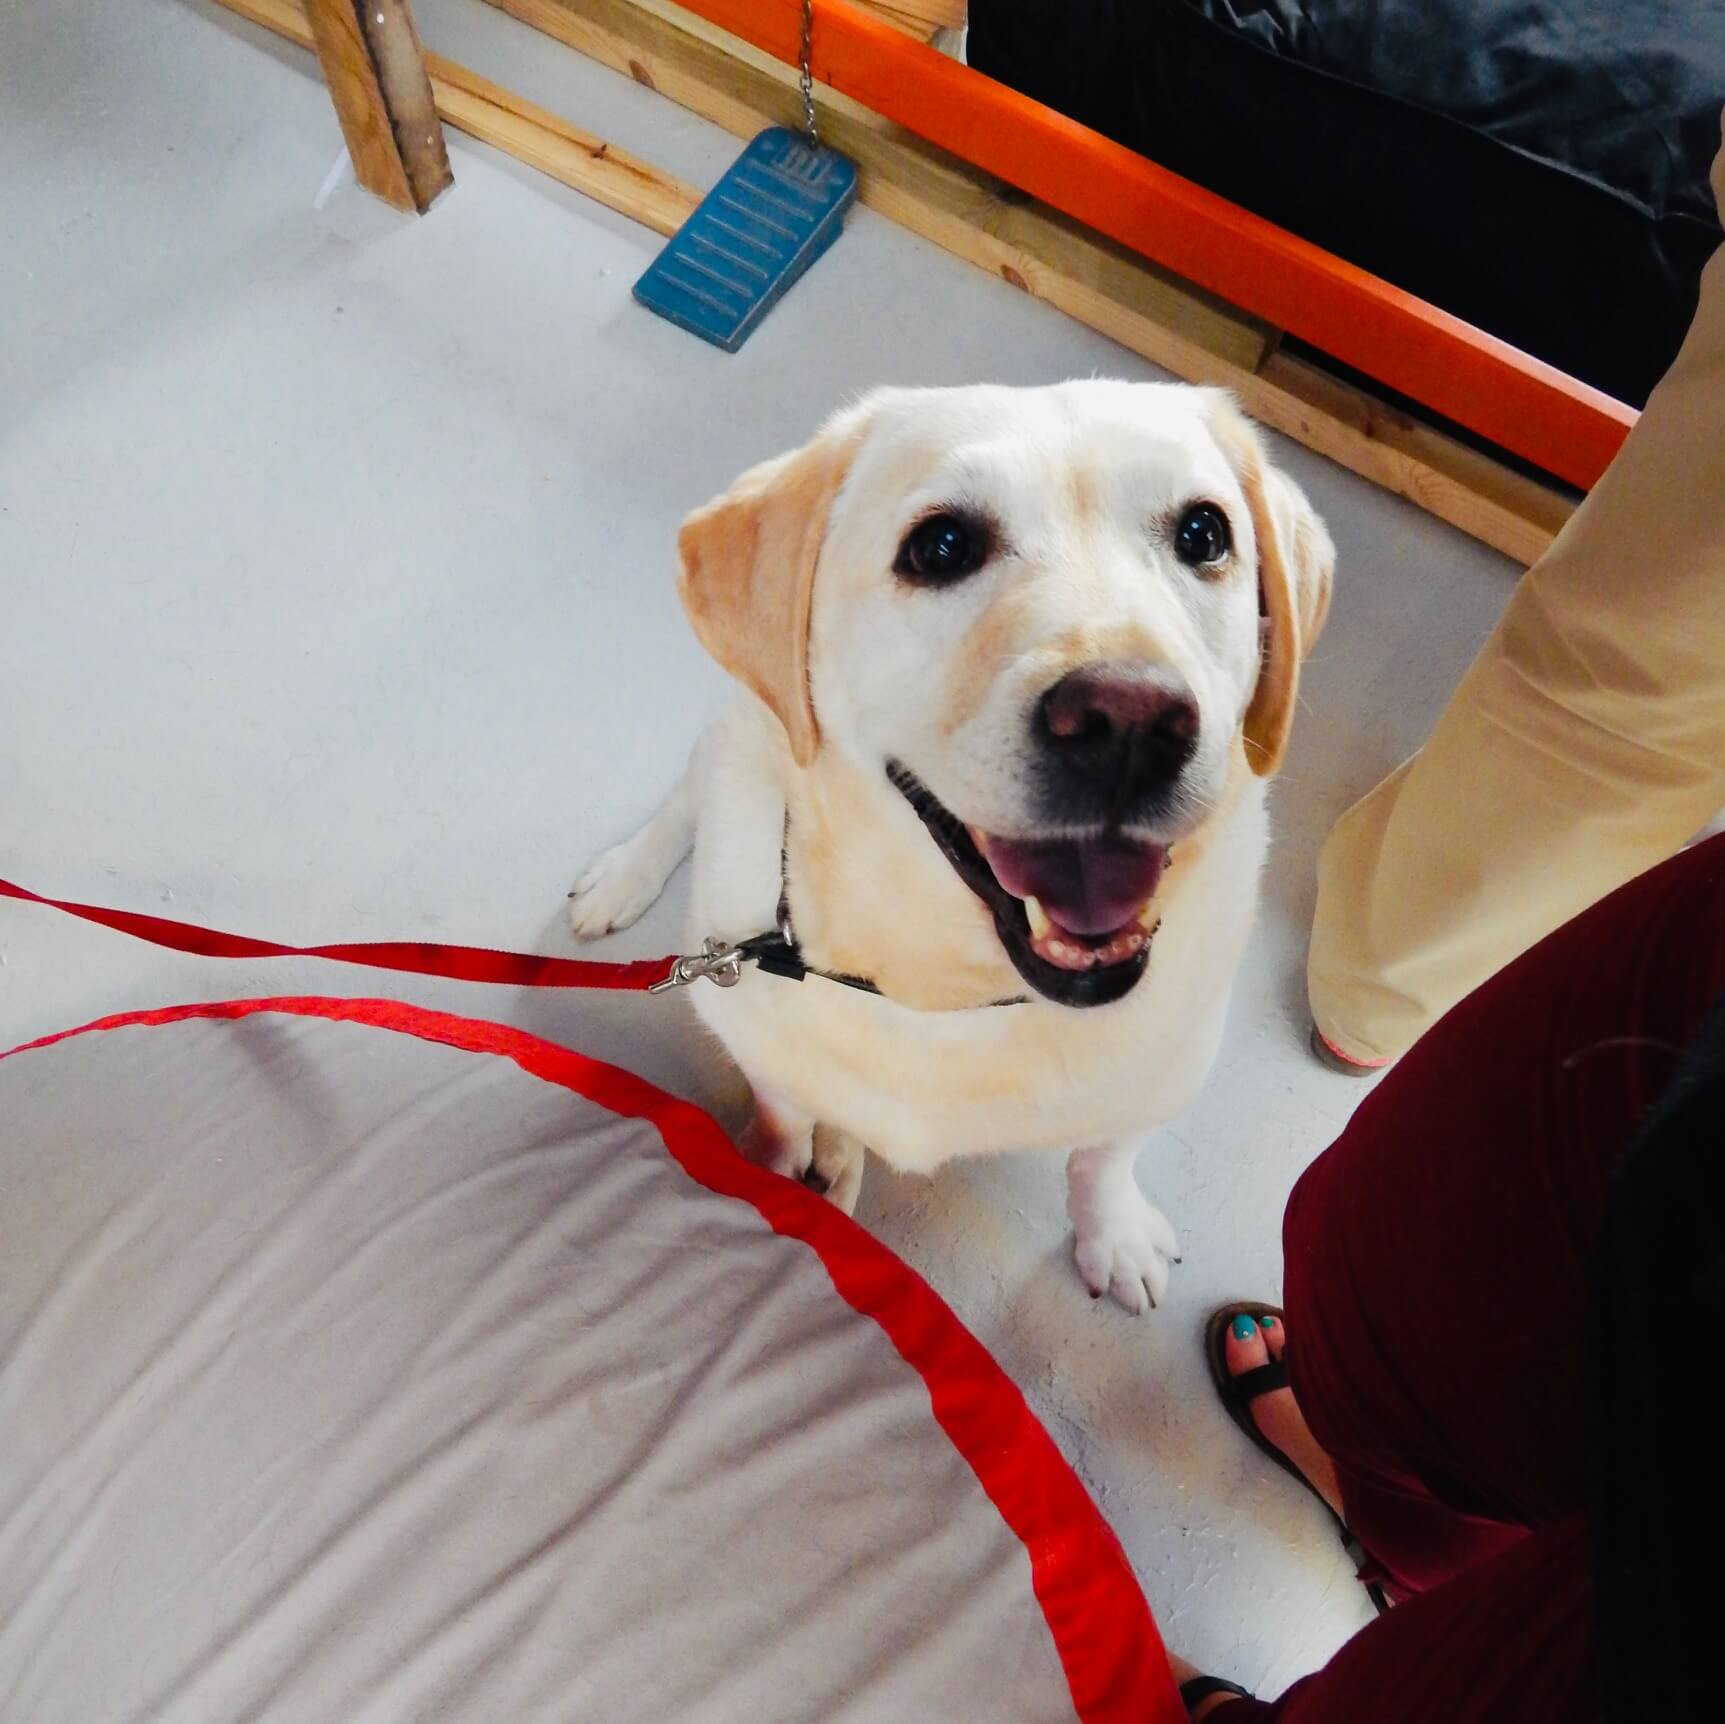 Golden retriever smiles next to his dog bed